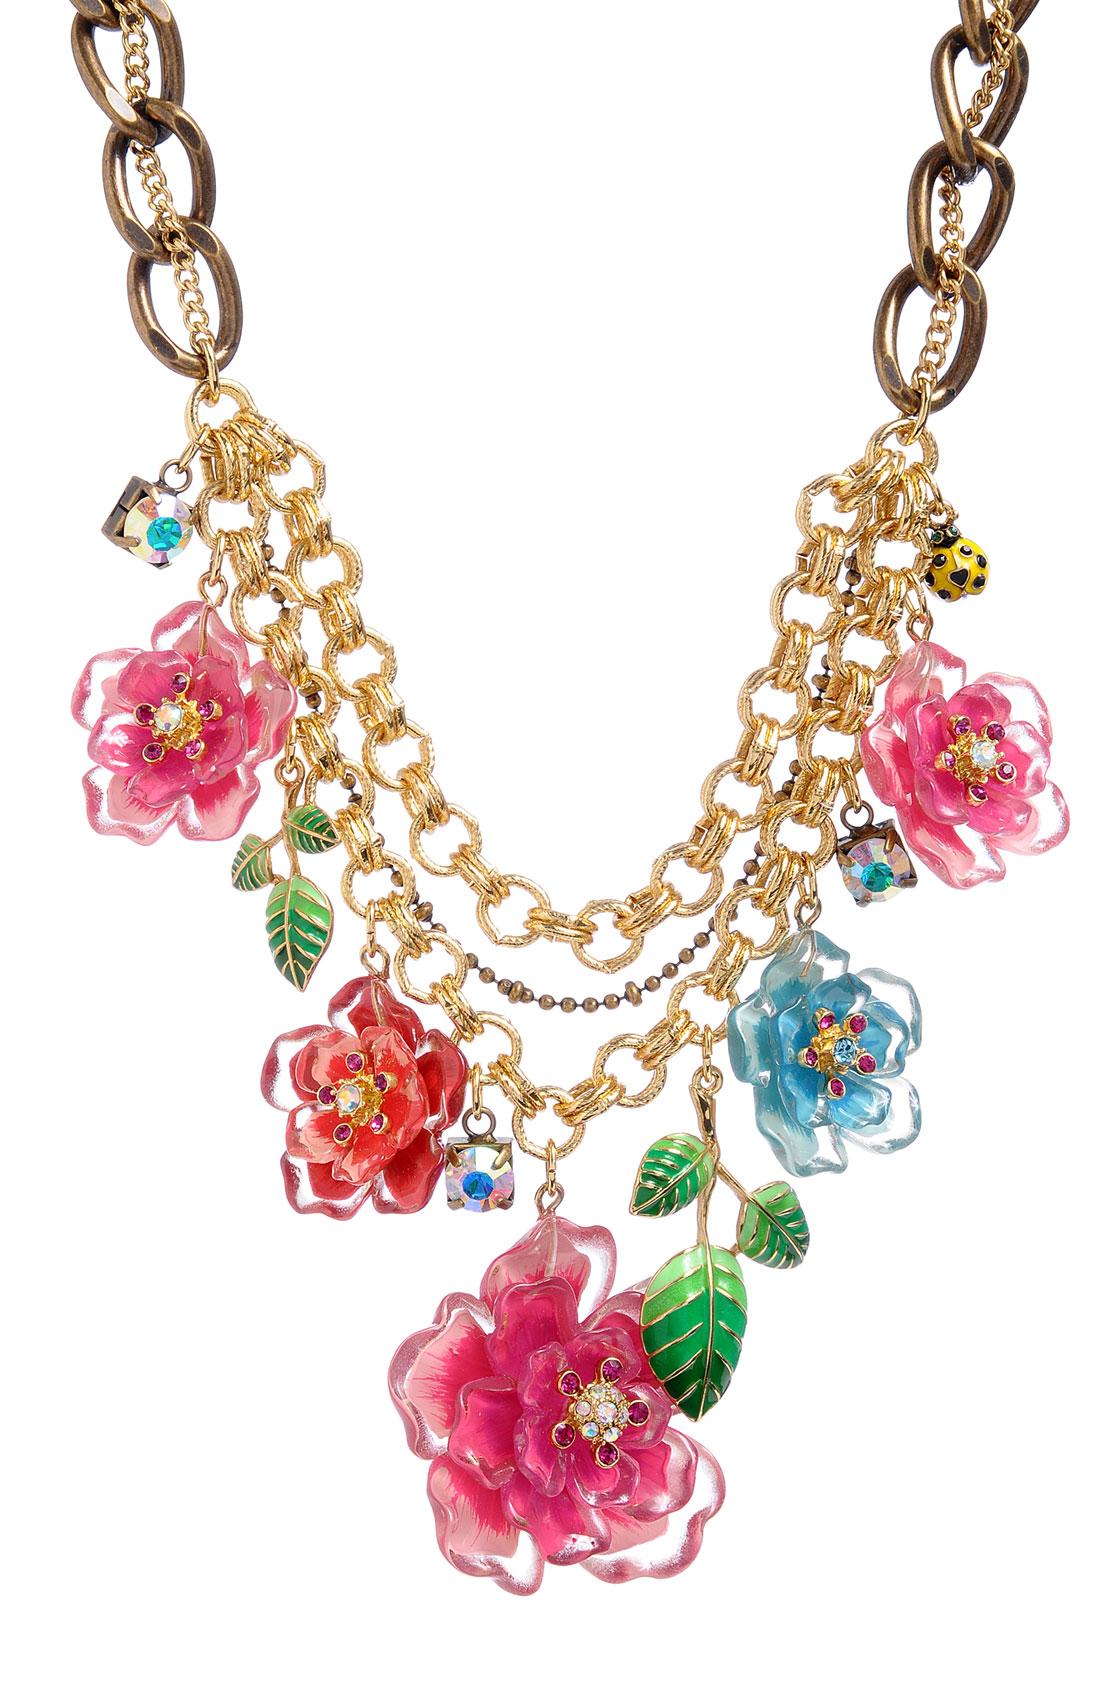 Betsey Johnson Hawaiian Luau Floral Bib Statement Necklace